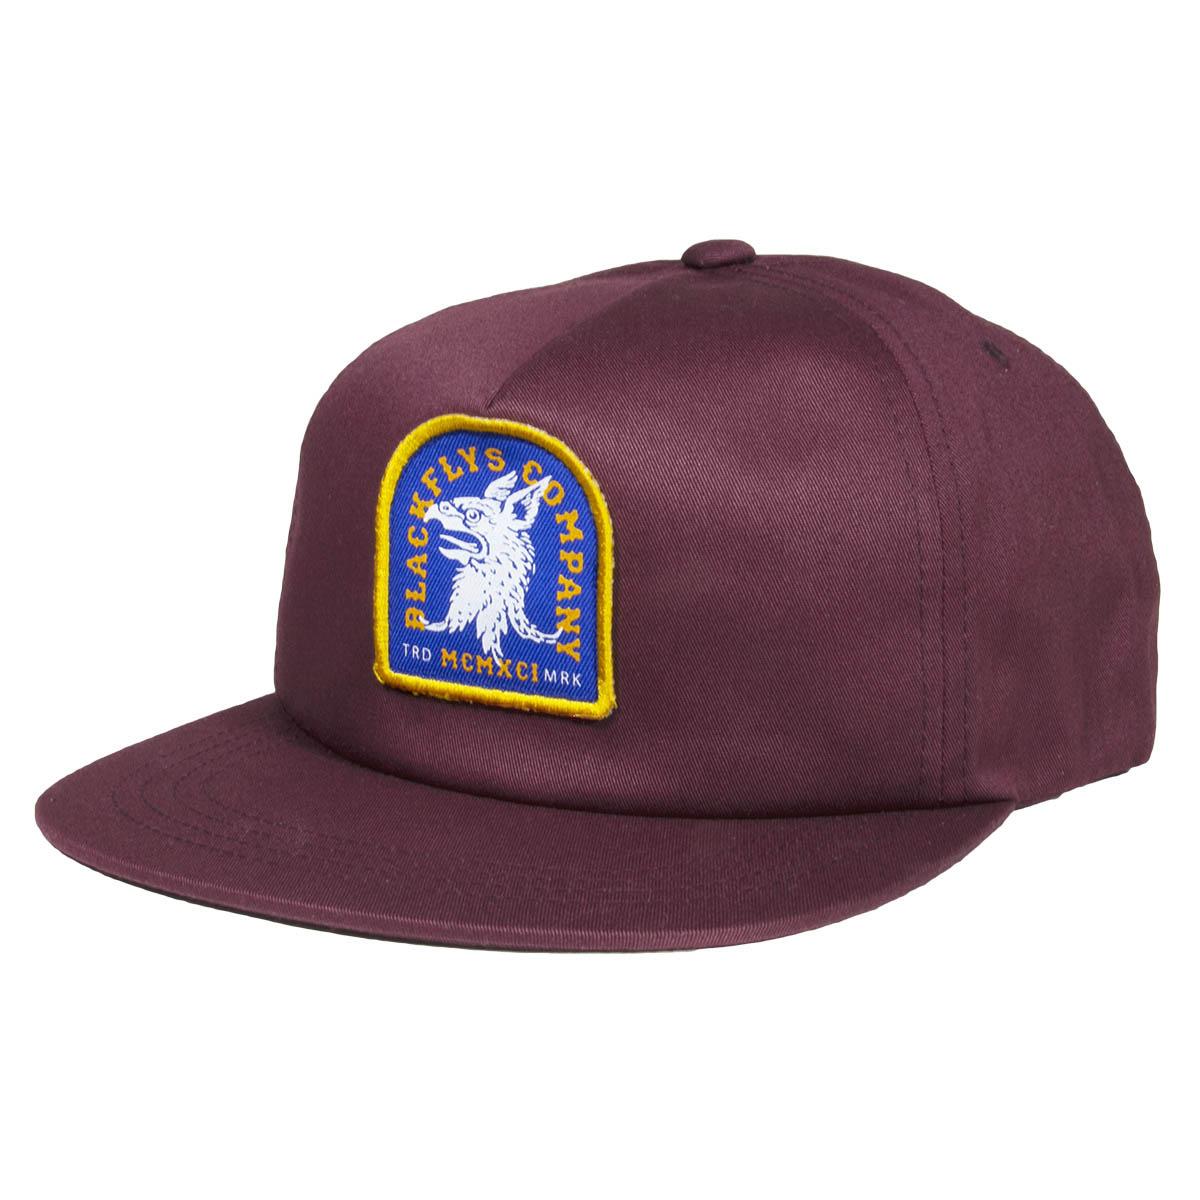 GRIFFIN SNAP BACK CAP